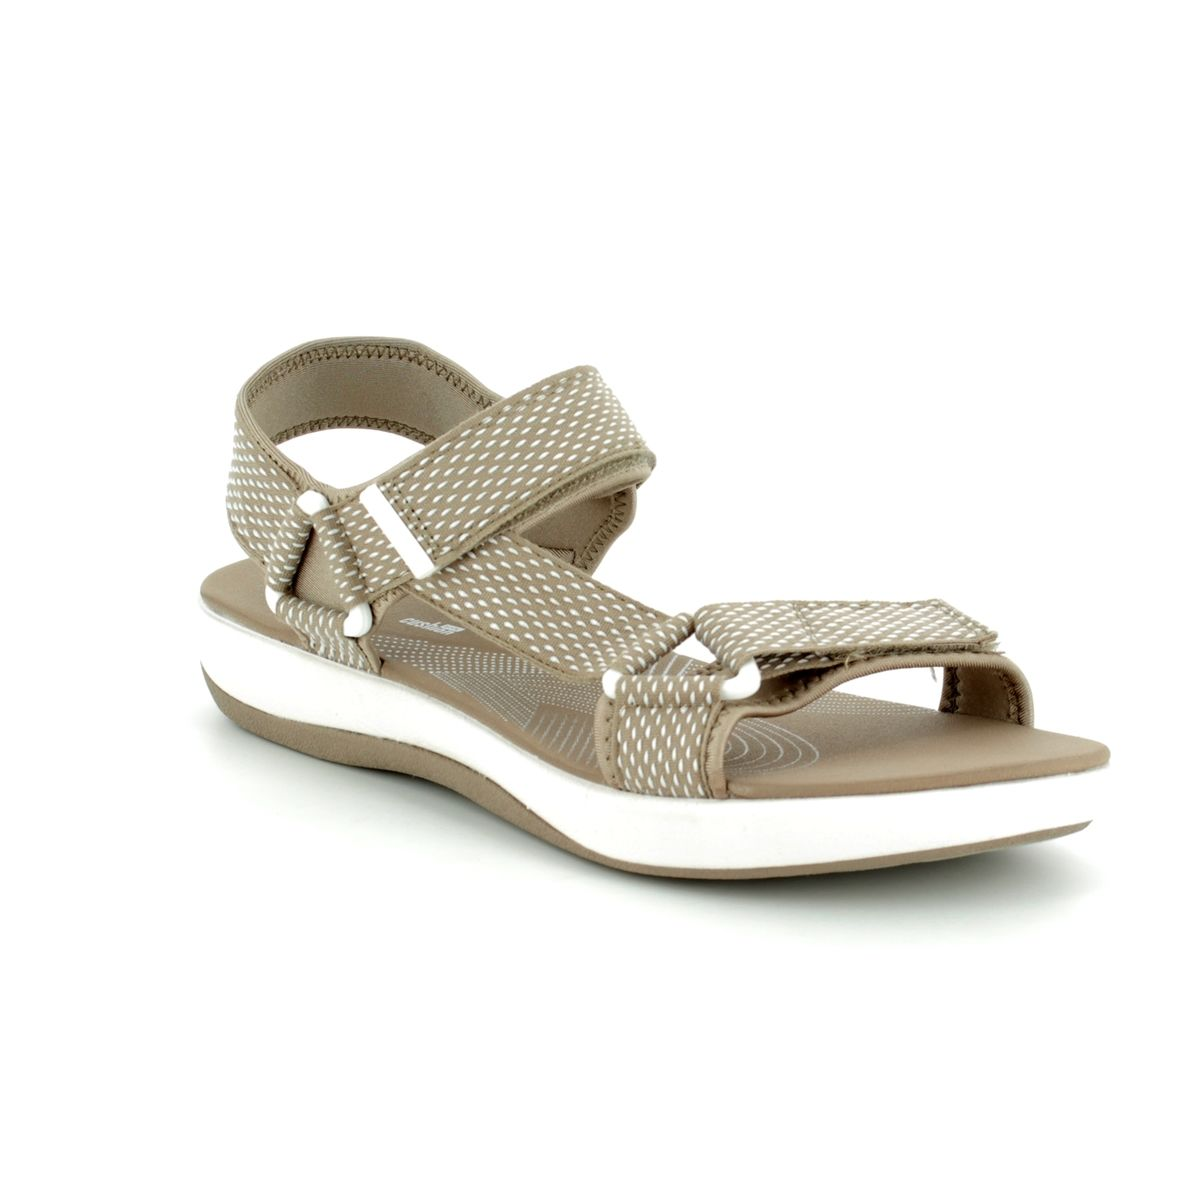 2242907bf07b Clarks Sandals - Sand - 3403 54D BRIZO CADY